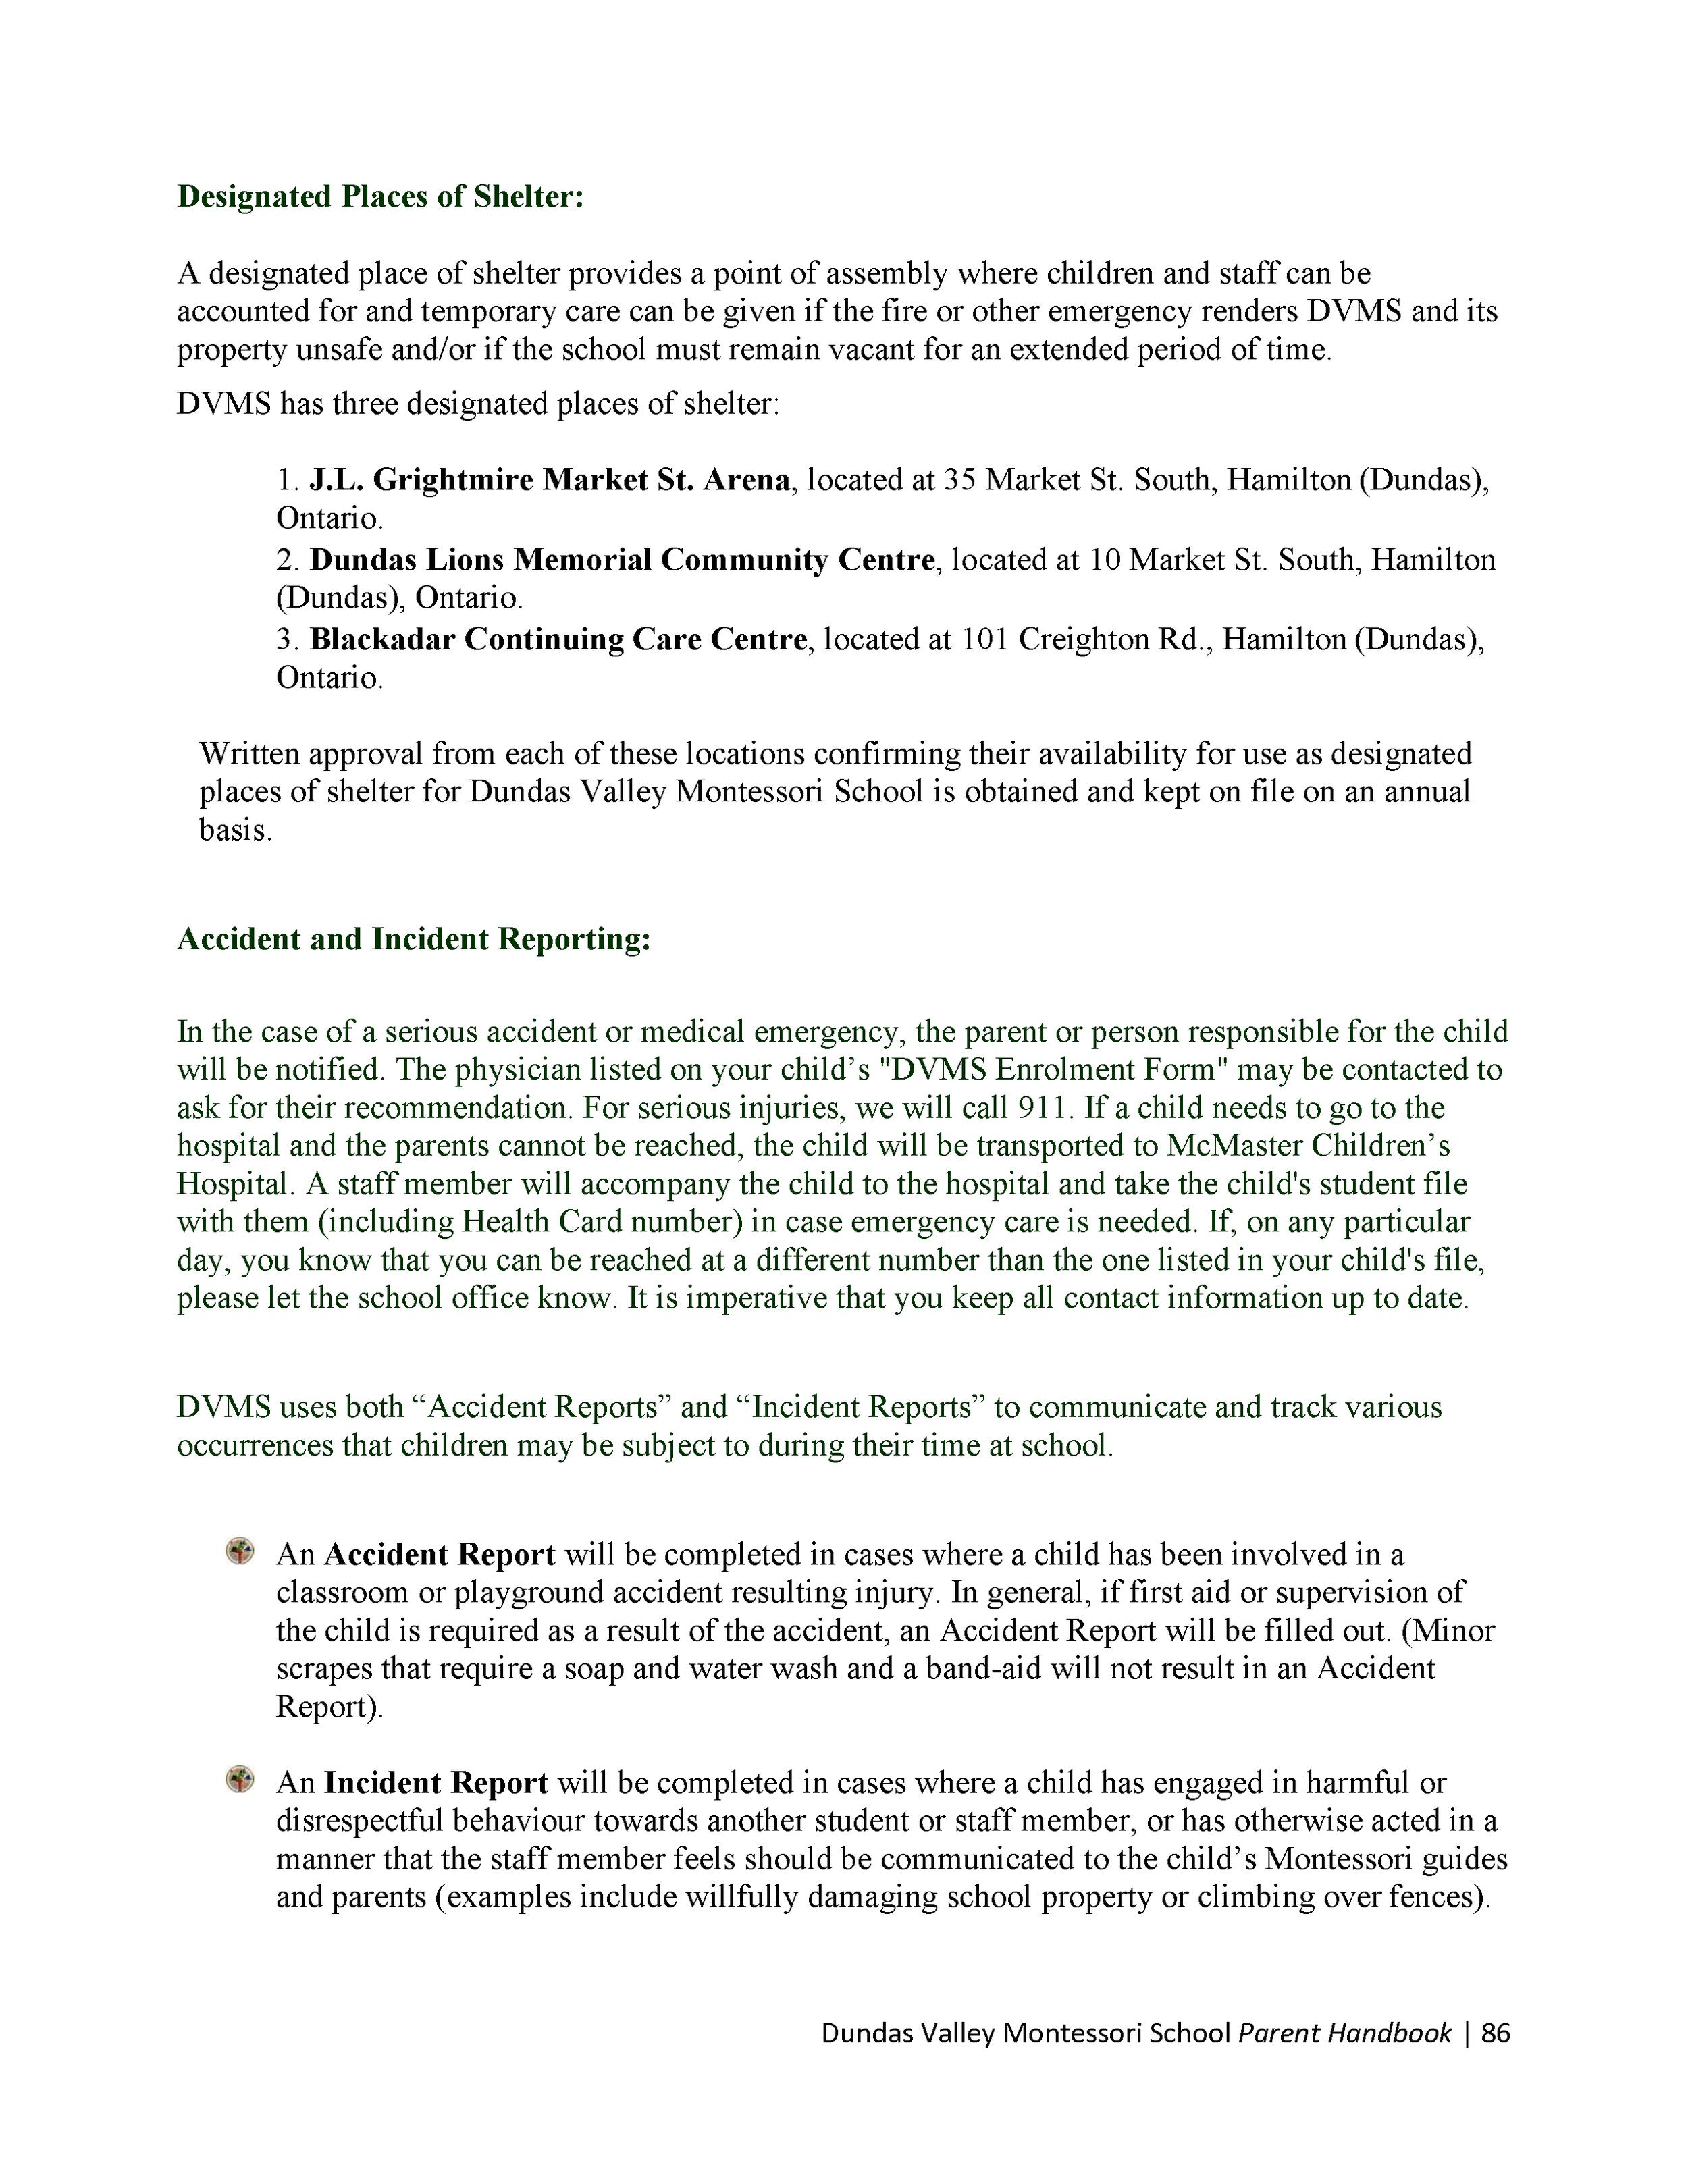 DVMS-Parent-Handbook-19-20_Page_088.png